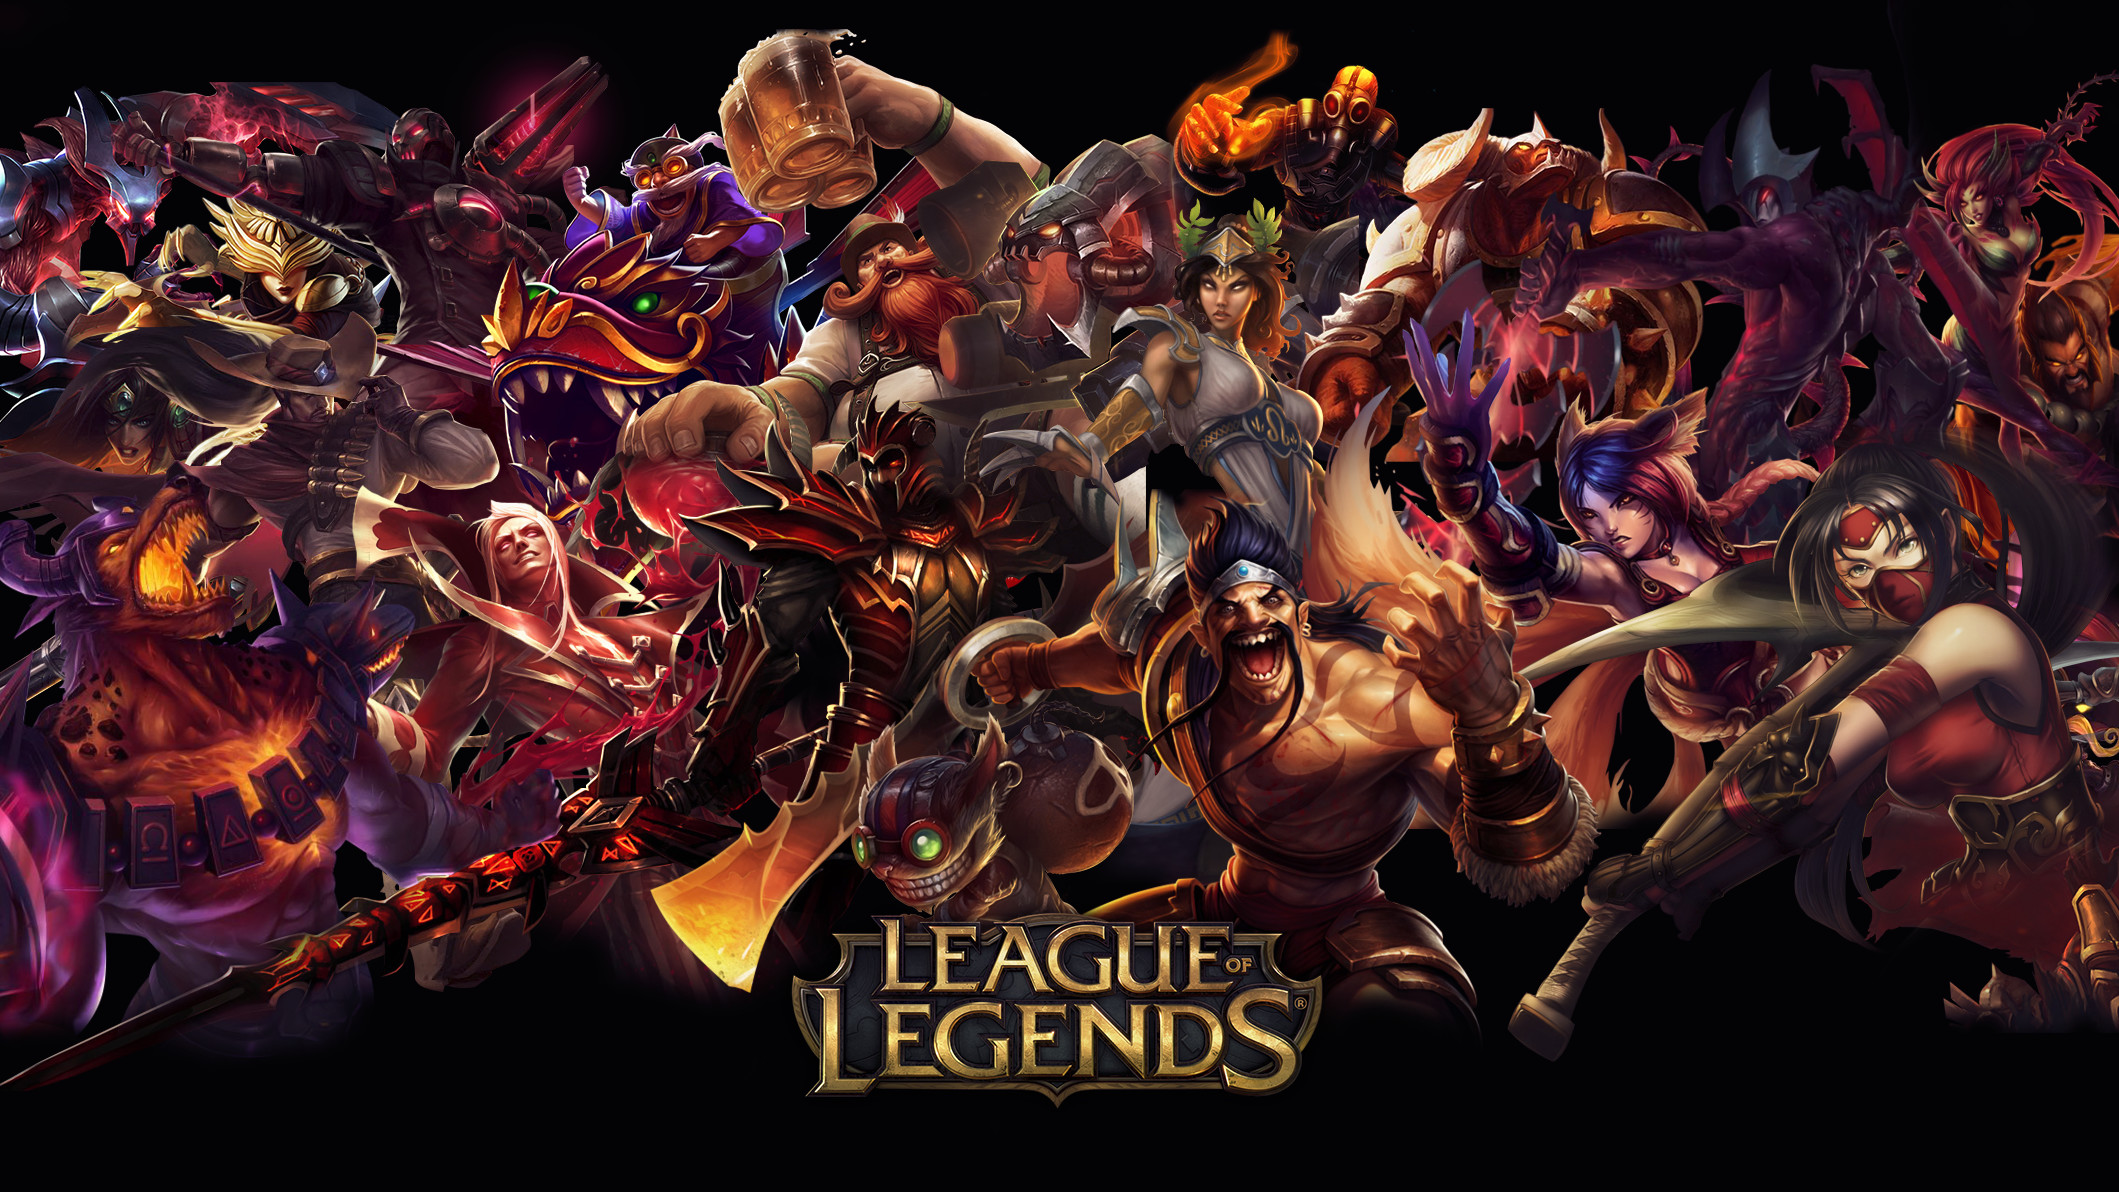 League of Legends Red Wallpaper